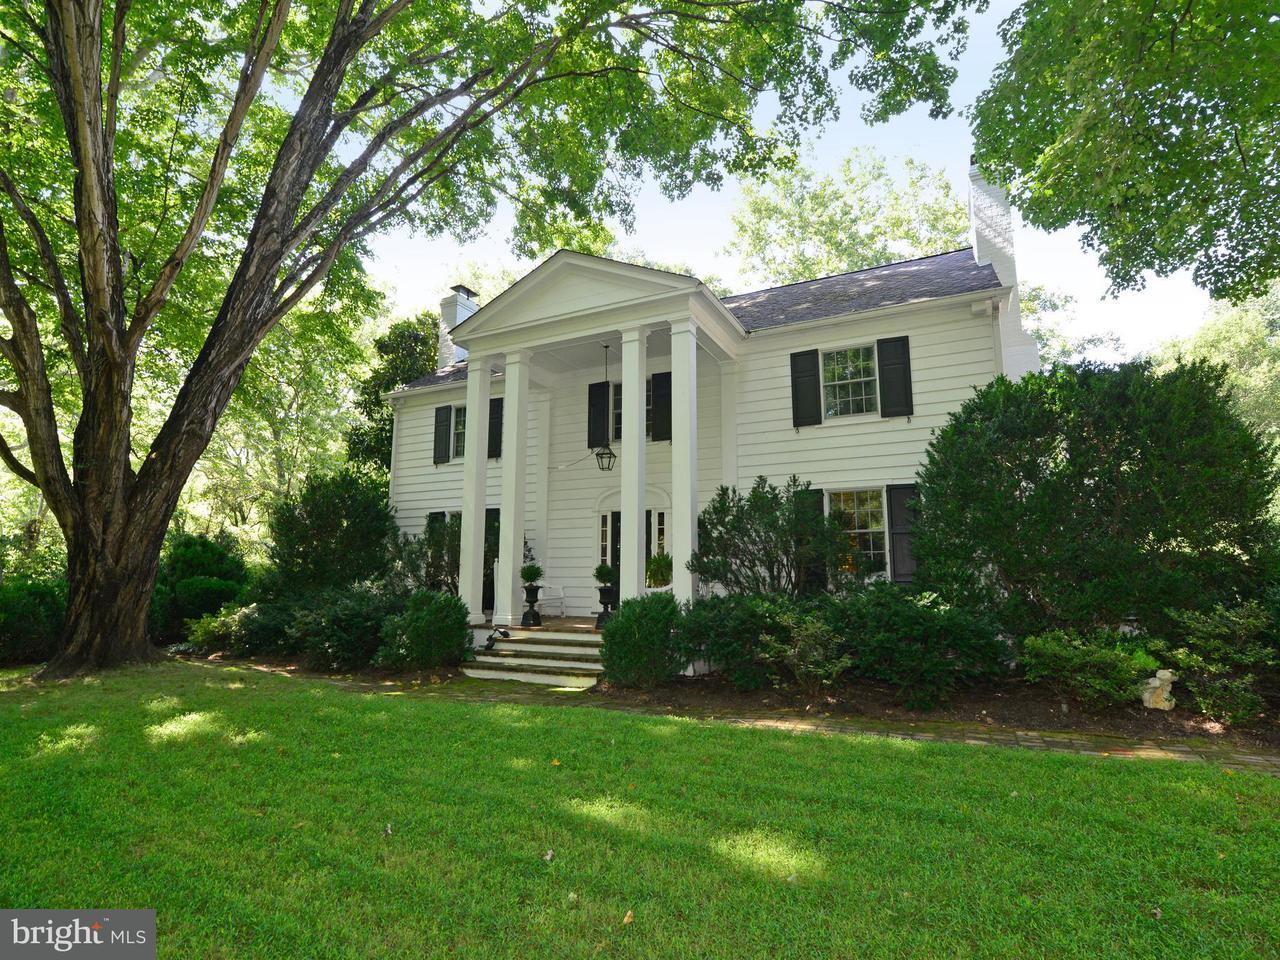 獨棟家庭住宅 為 出售 在 3072 Swift Shoals Road 3072 Swift Shoals Road Boyce, 弗吉尼亞州 22620 美國